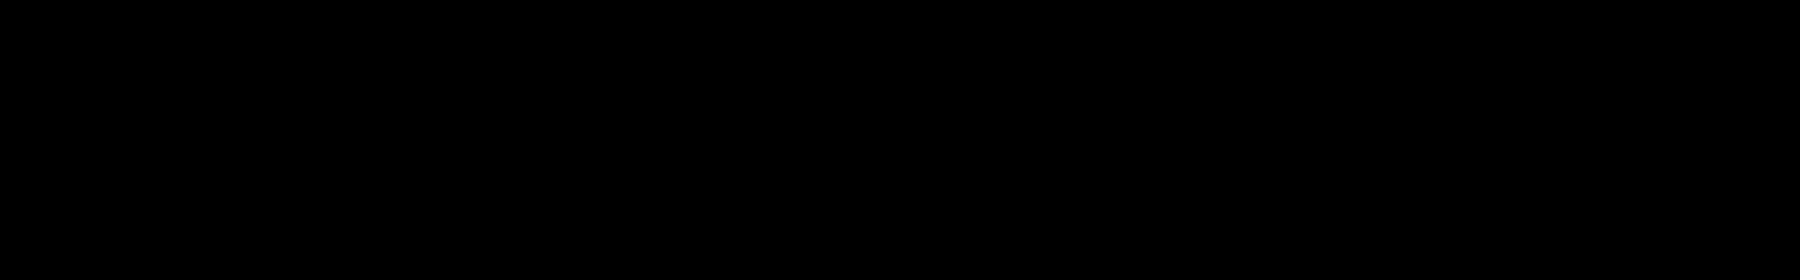 TECHNO PACK audio waveform